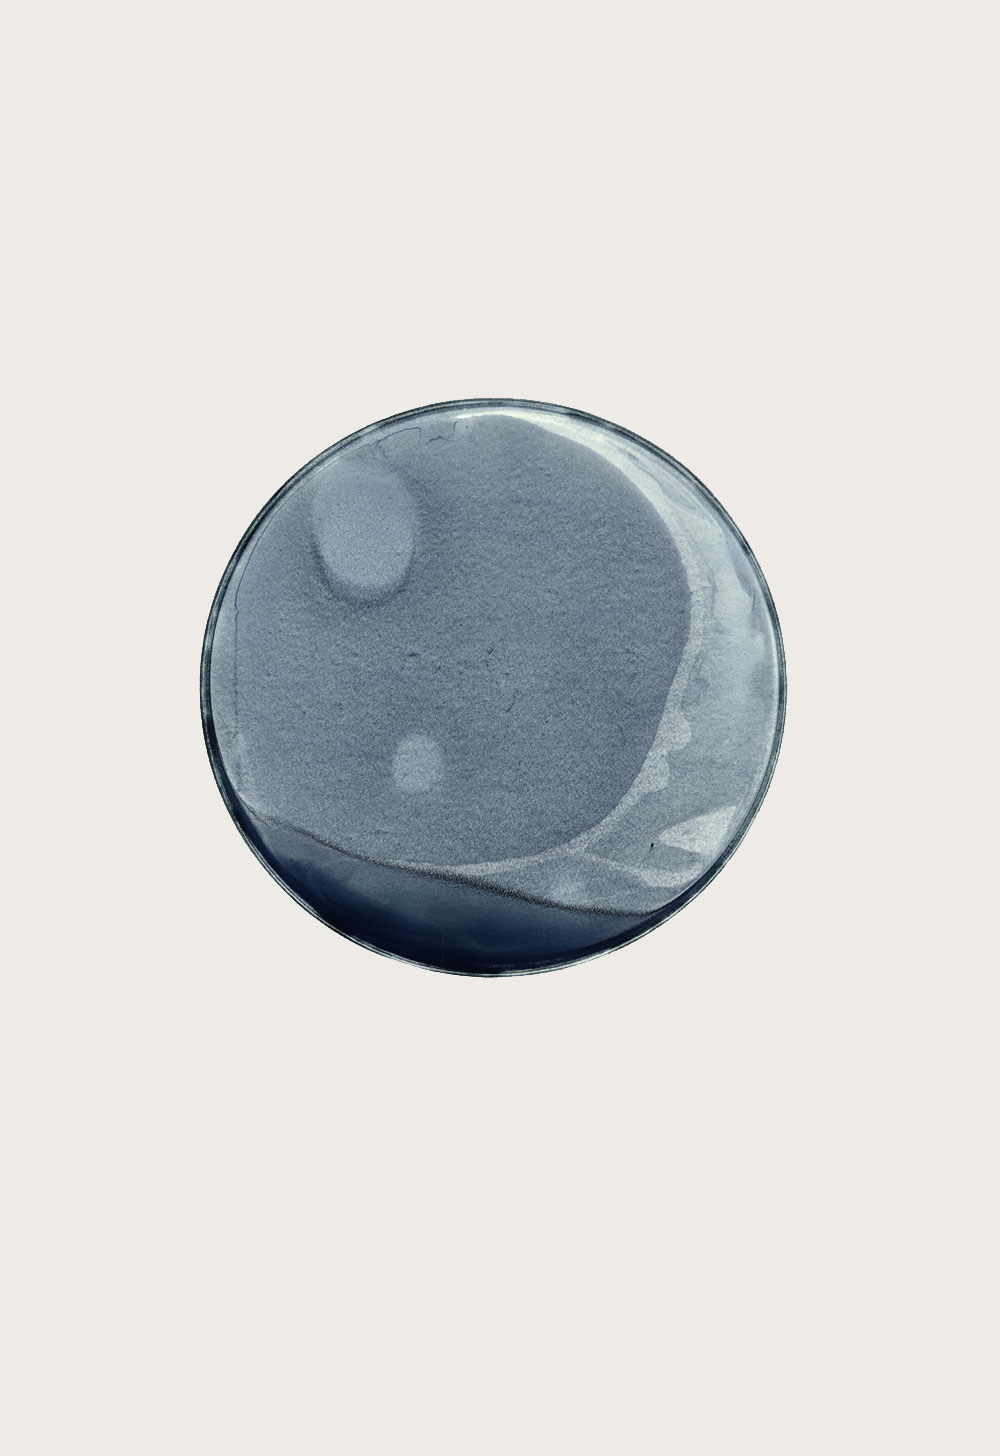 THIS IS NOW – indigo (II)  2010  pigment dispersal on 100% cotton fibre  101.0 x 73.7 cm,Ø 36.6 cm